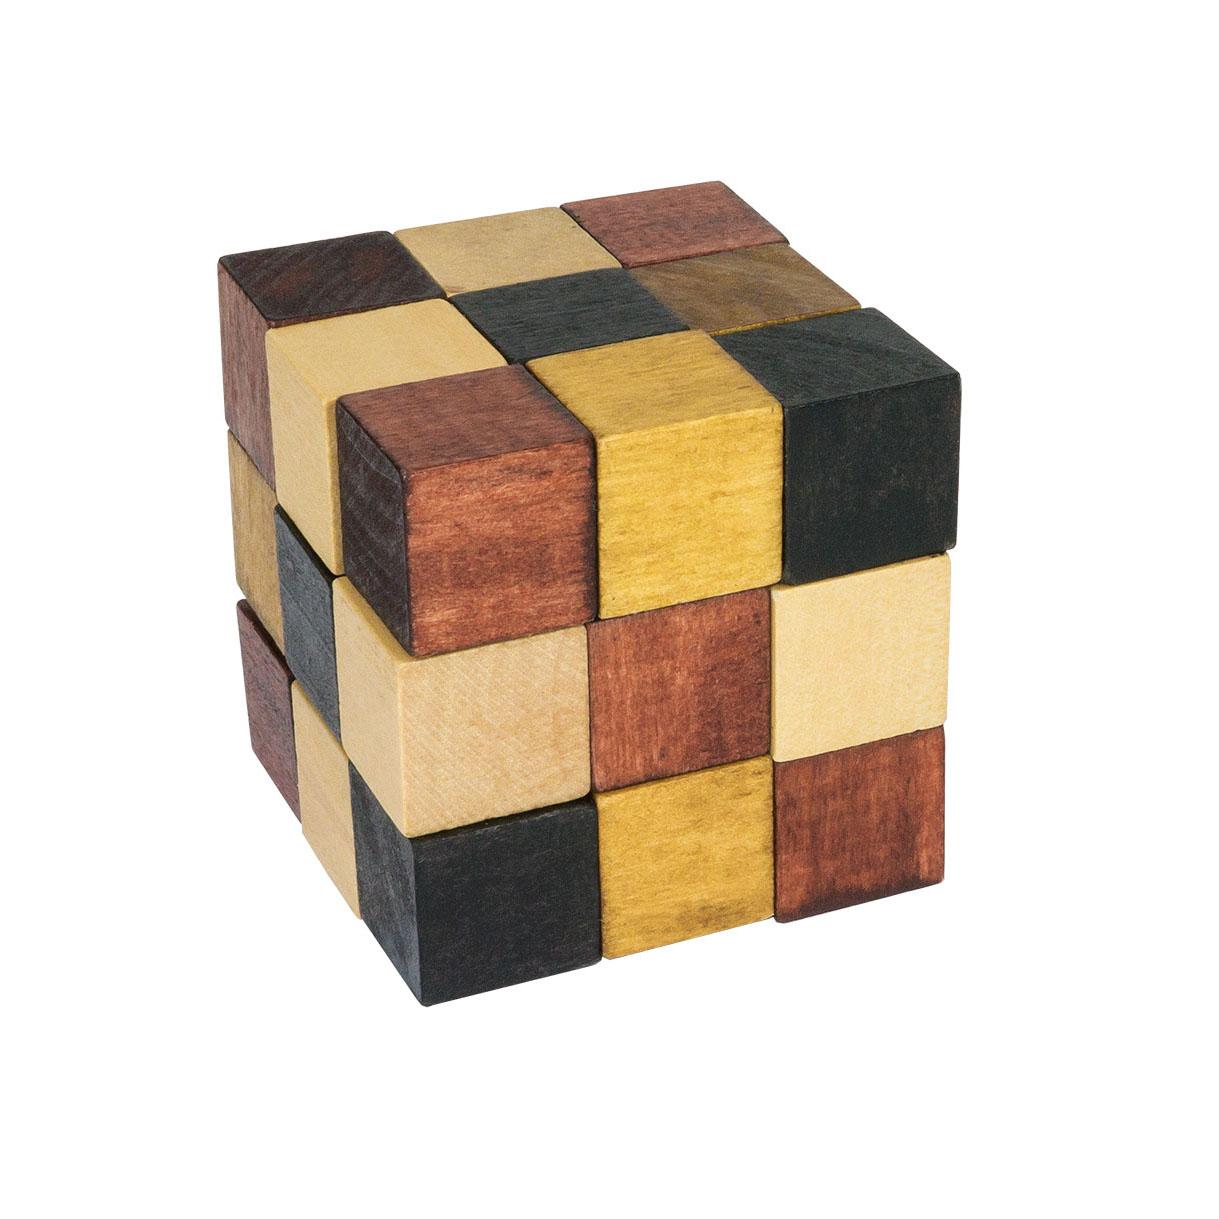 PuzzleAcademyNEW (7 of 7)